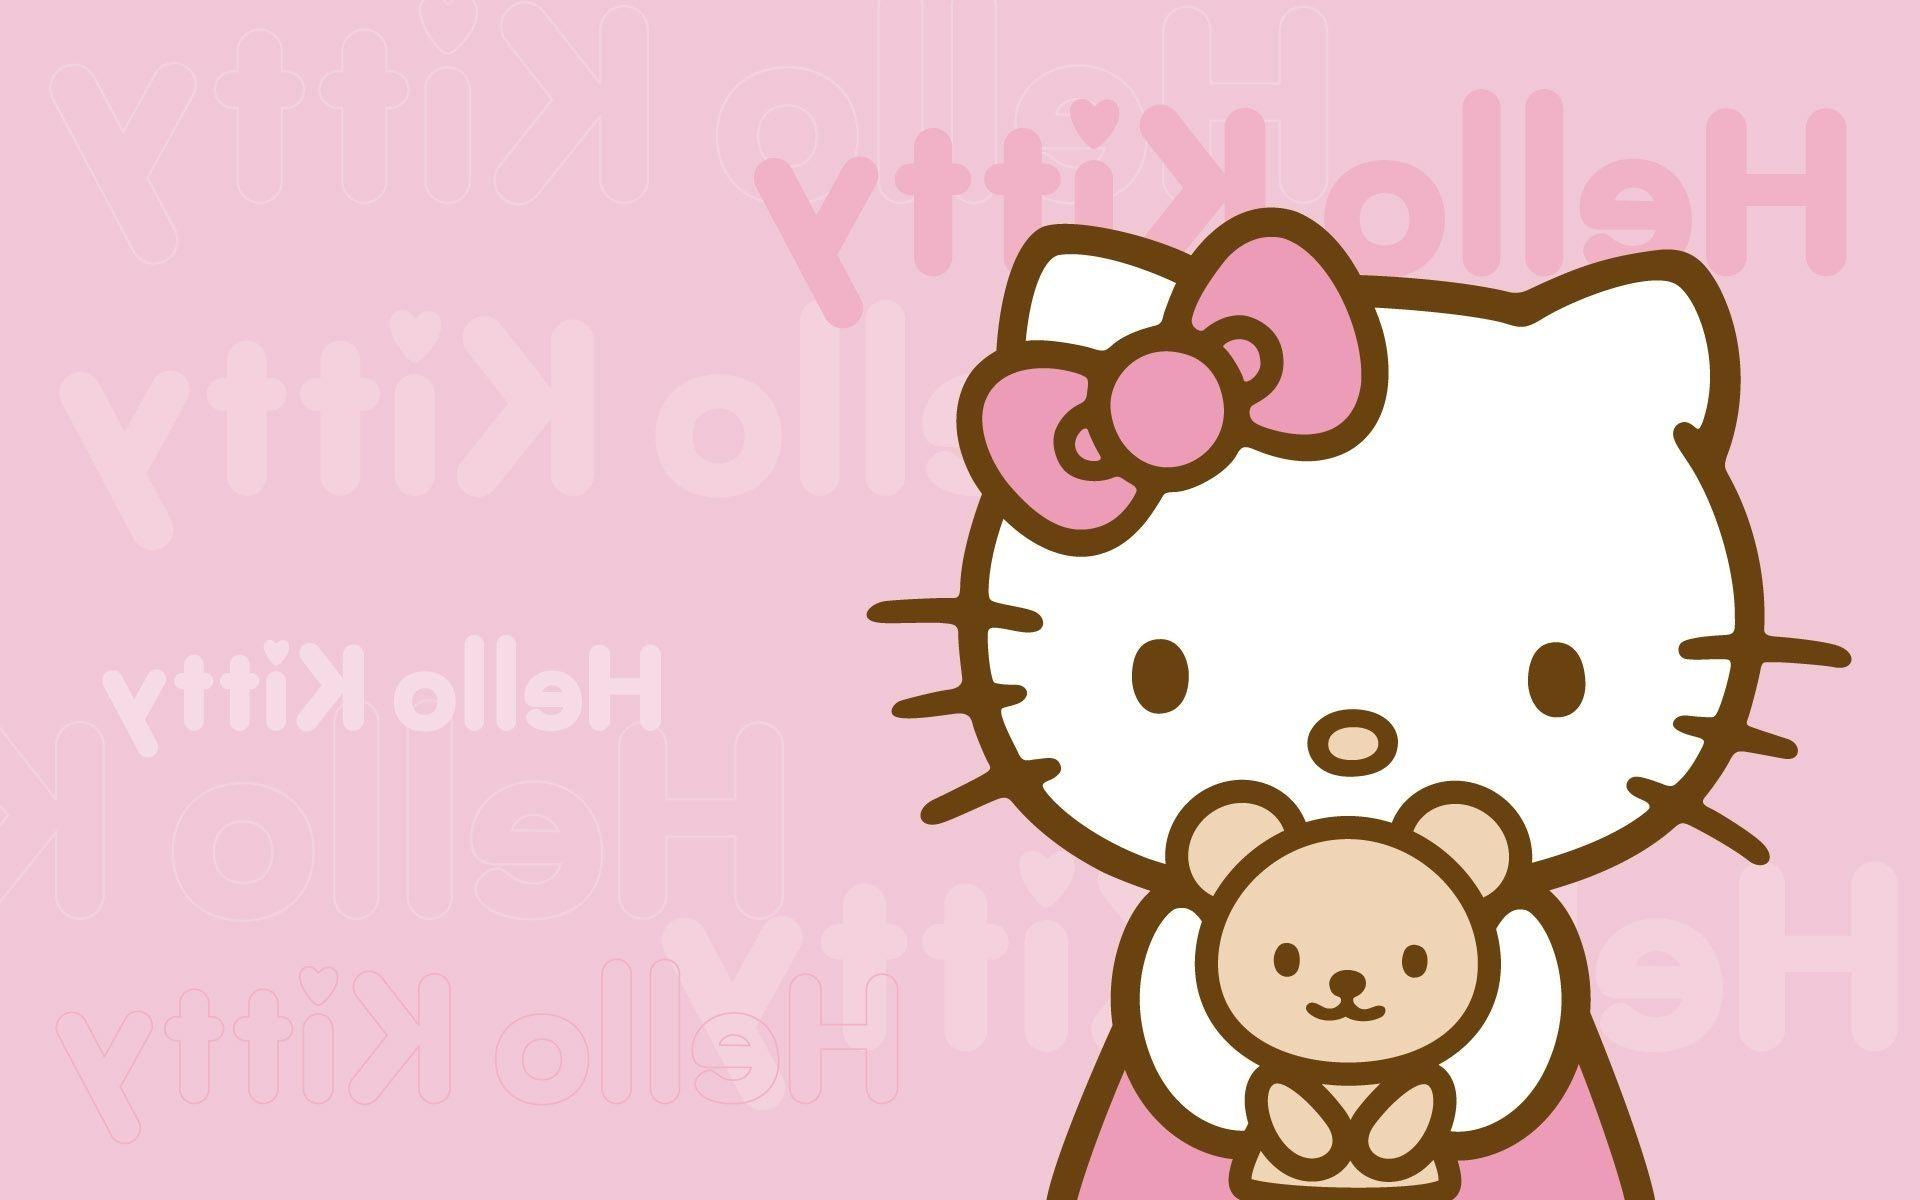 Cool Wallpaper Hello Kitty Desktop Background - 7b74c310700f240e1d6864b1dd97555d  Pictures_23842.jpg